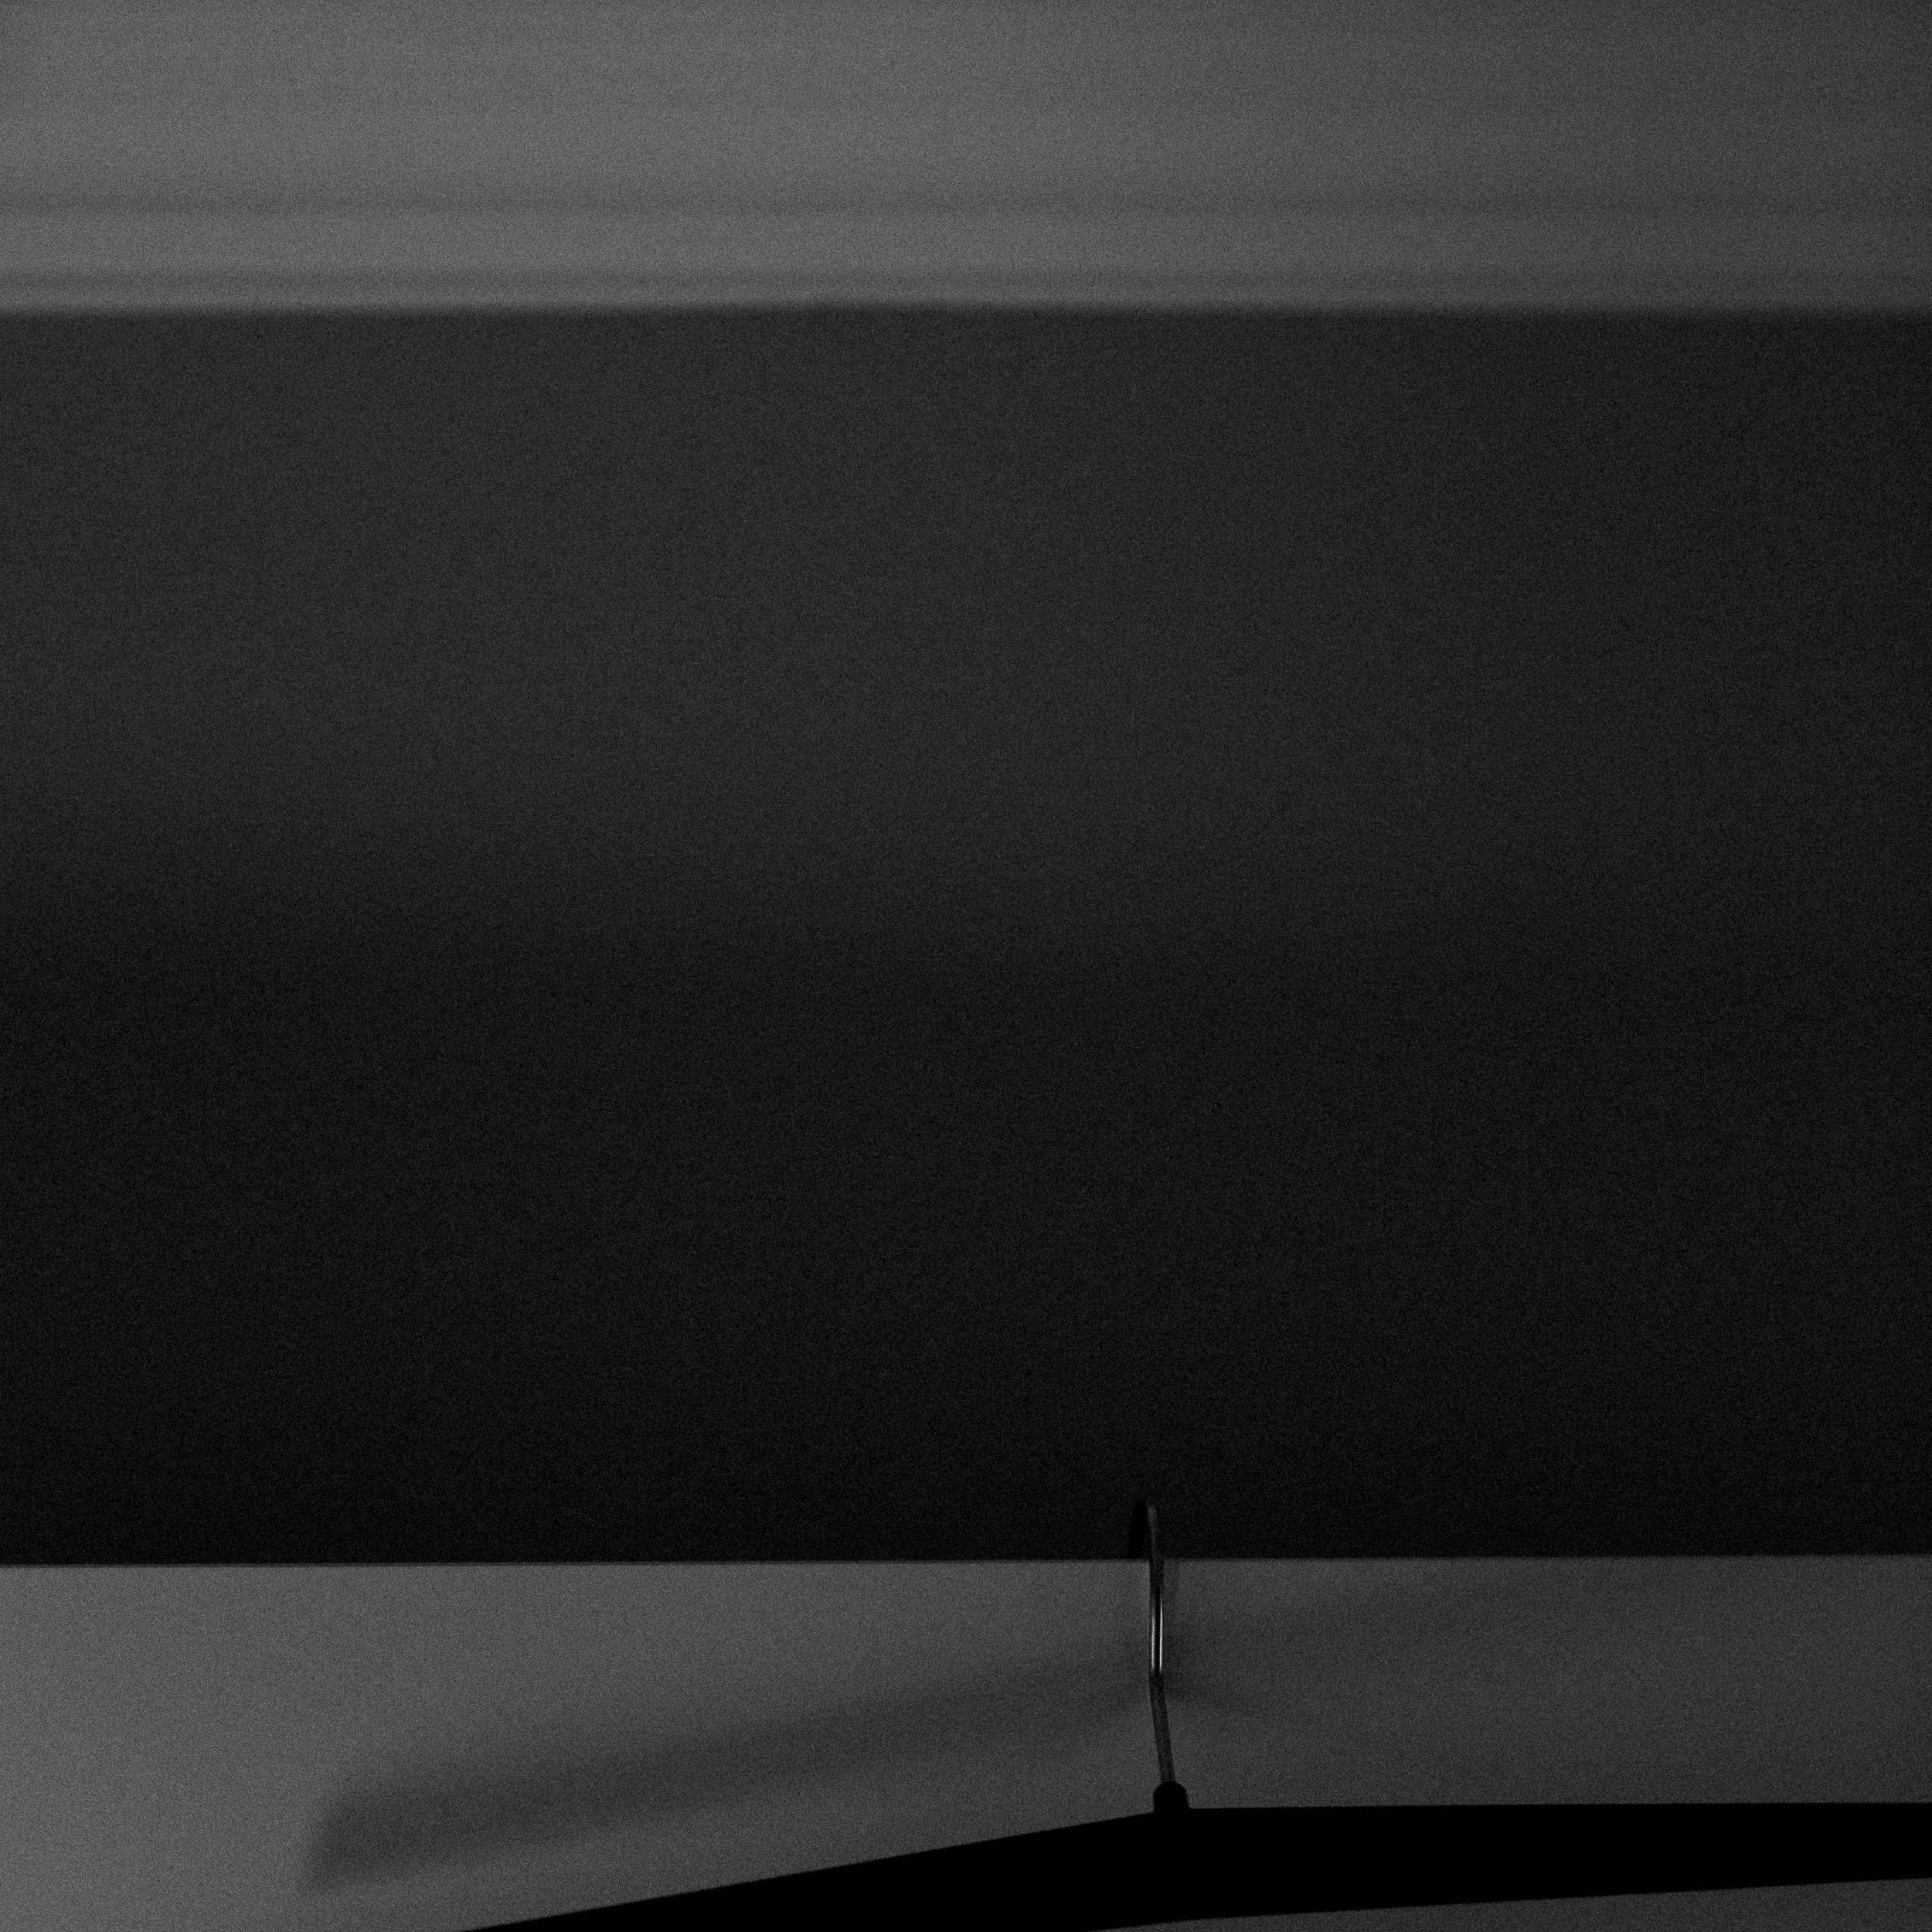 Frode_Olsen_Fine_art_photography_The_Rorschach_Exposures_06.jpg